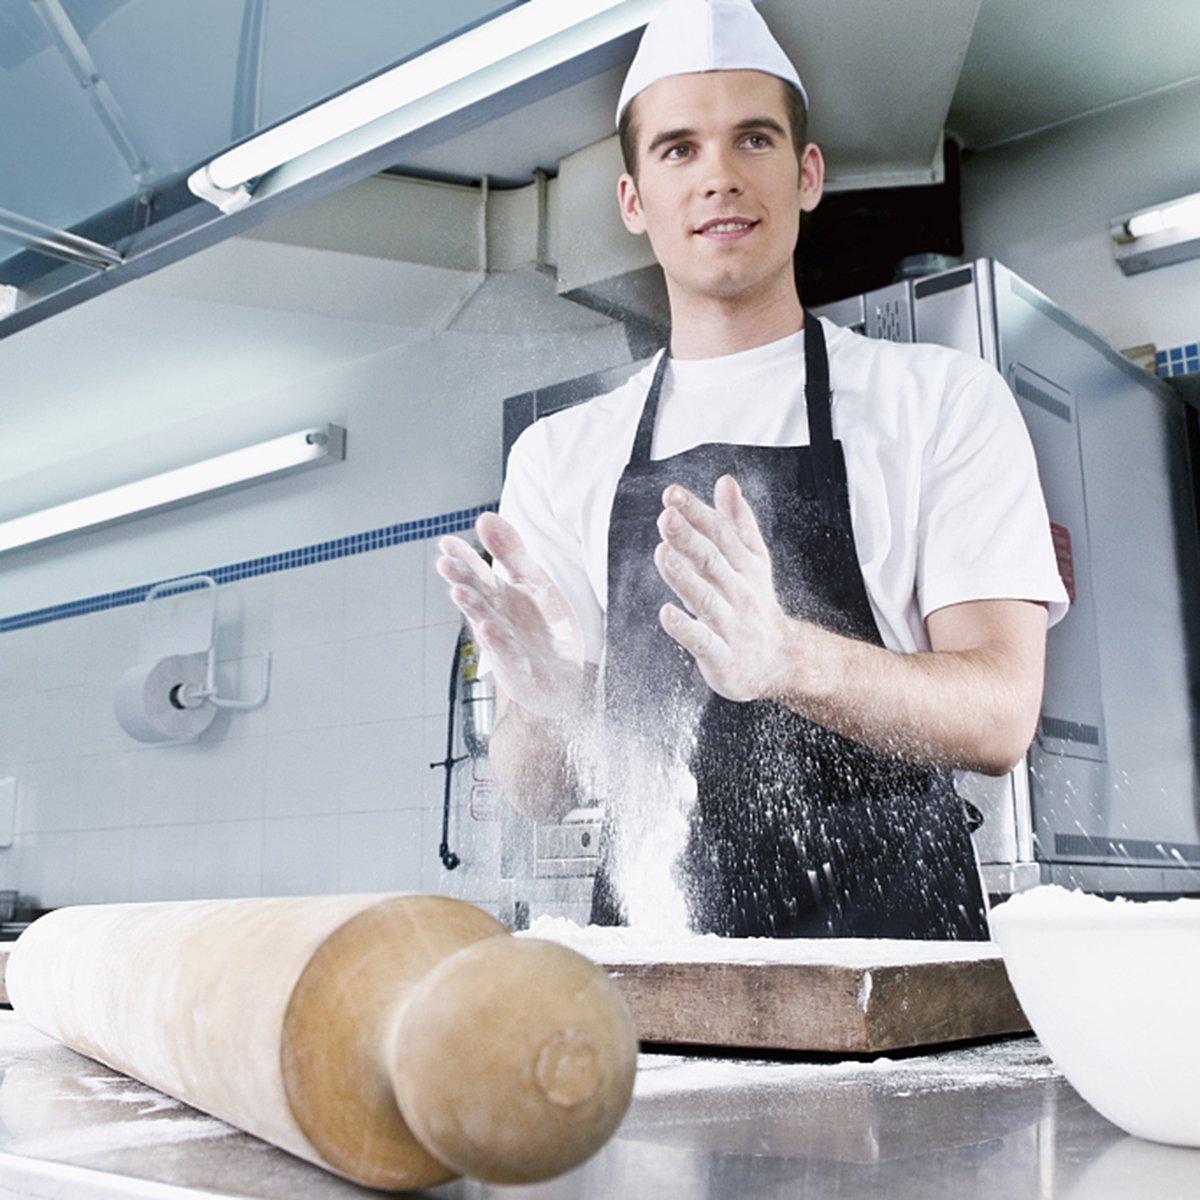 Jespekerere Apron with Pockets Black Cooking Bib Apron for Chefs Men Women on Kitchen Studio Restaurant 1 PCS 60x70CM (23.6 x 27.6 inch)